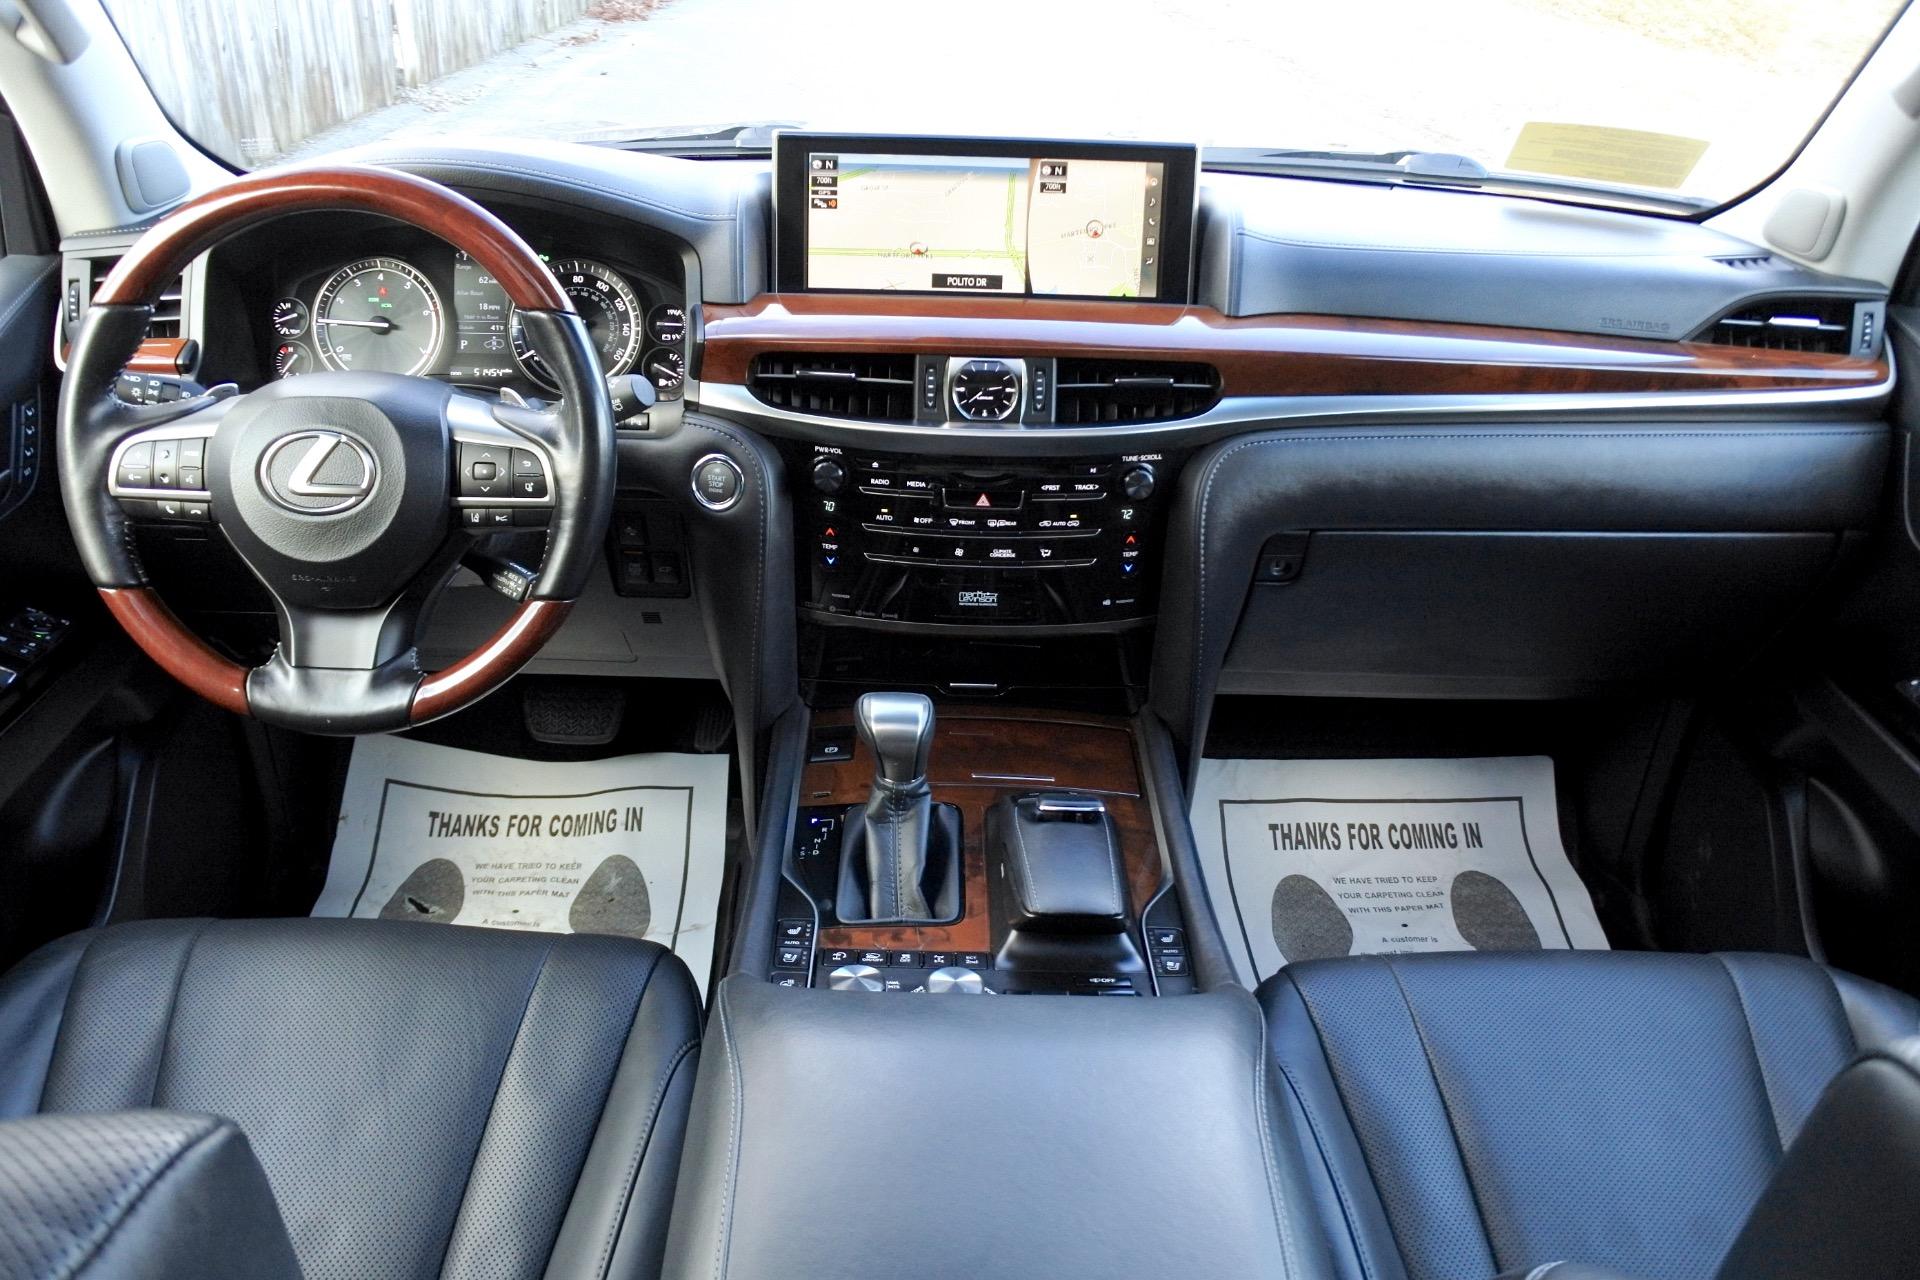 Used 2017 Lexus Lx LX 570 4WD Used 2017 Lexus Lx LX 570 4WD for sale  at Metro West Motorcars LLC in Shrewsbury MA 9